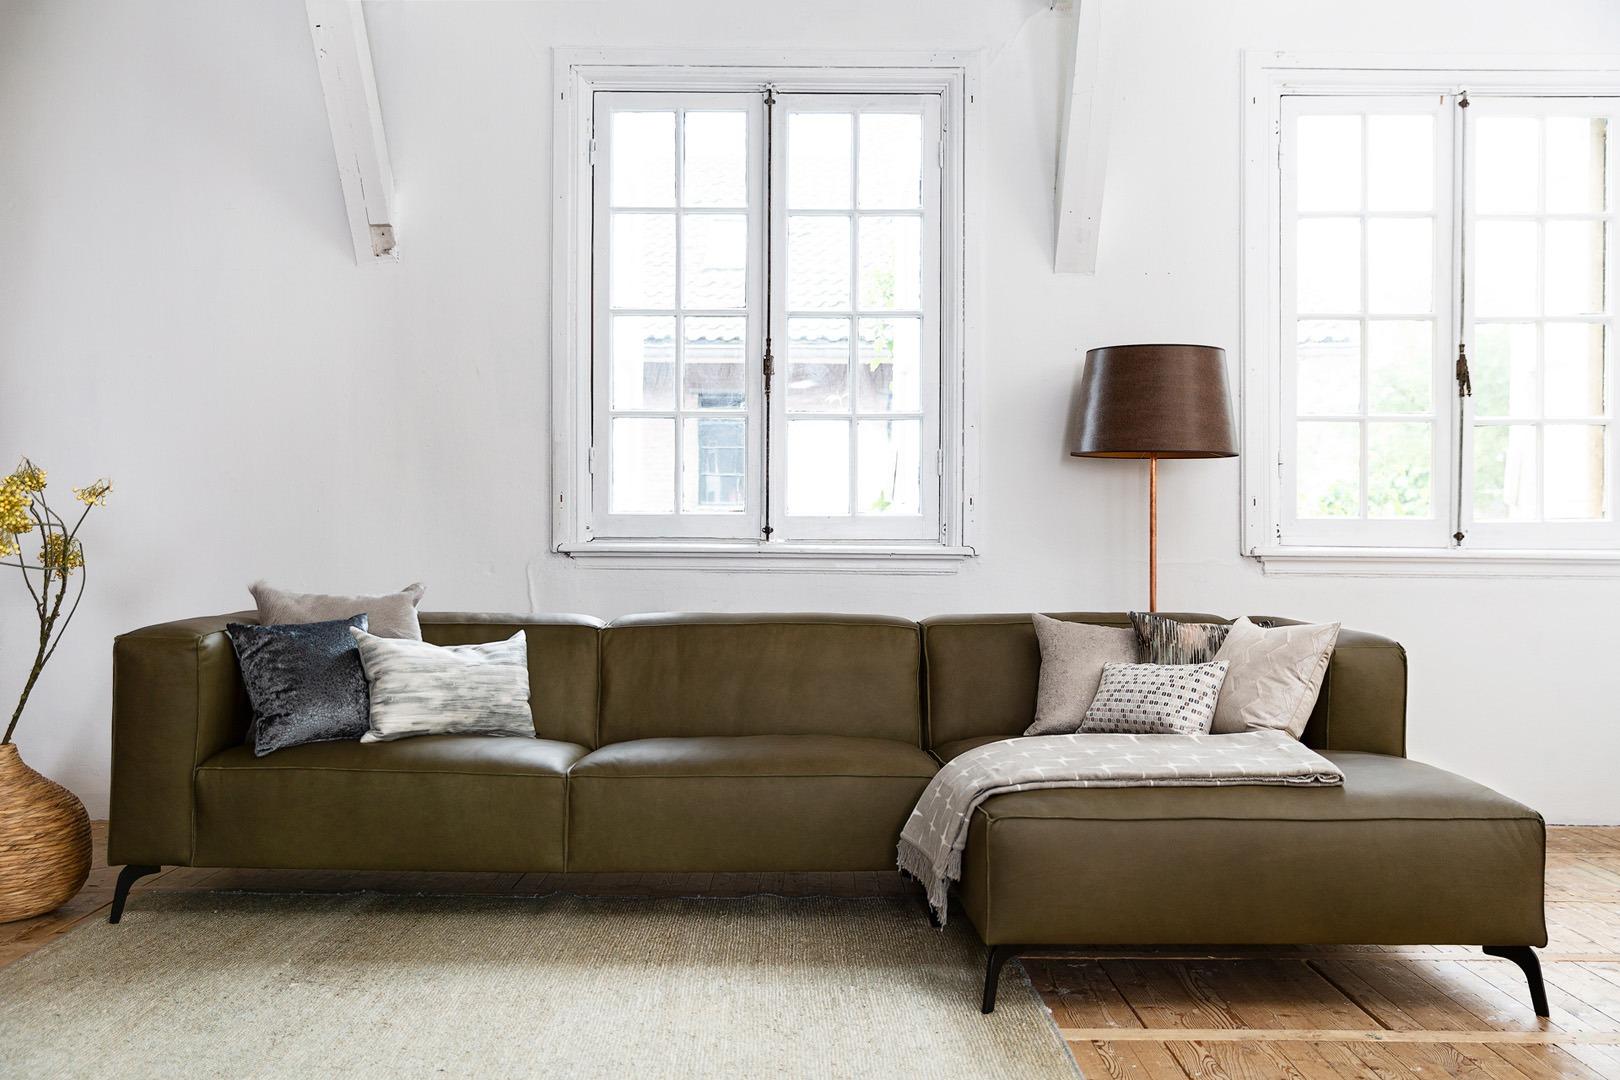 SM Vino-piemonte-longchair-groen-leer-soofs-interieur.